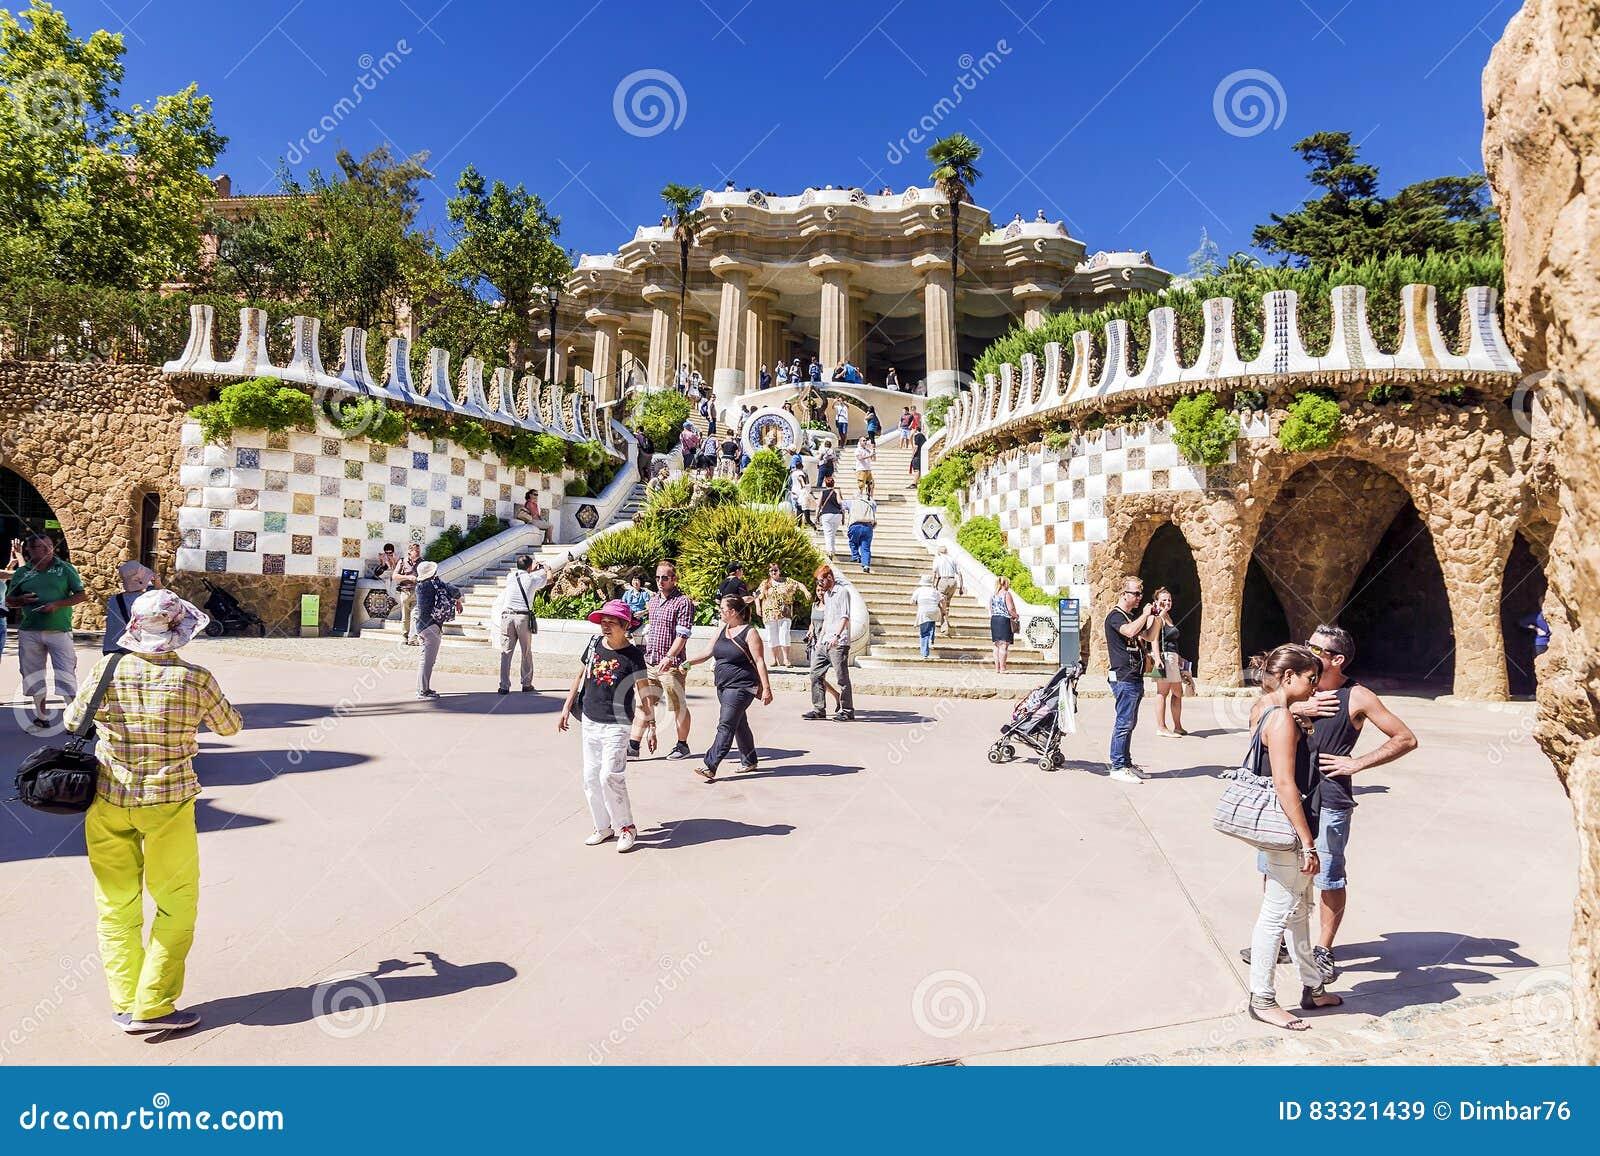 BARCELONA, SPAIN - SEPTEMBER 17, 2015: Entrance at the Parc Gue